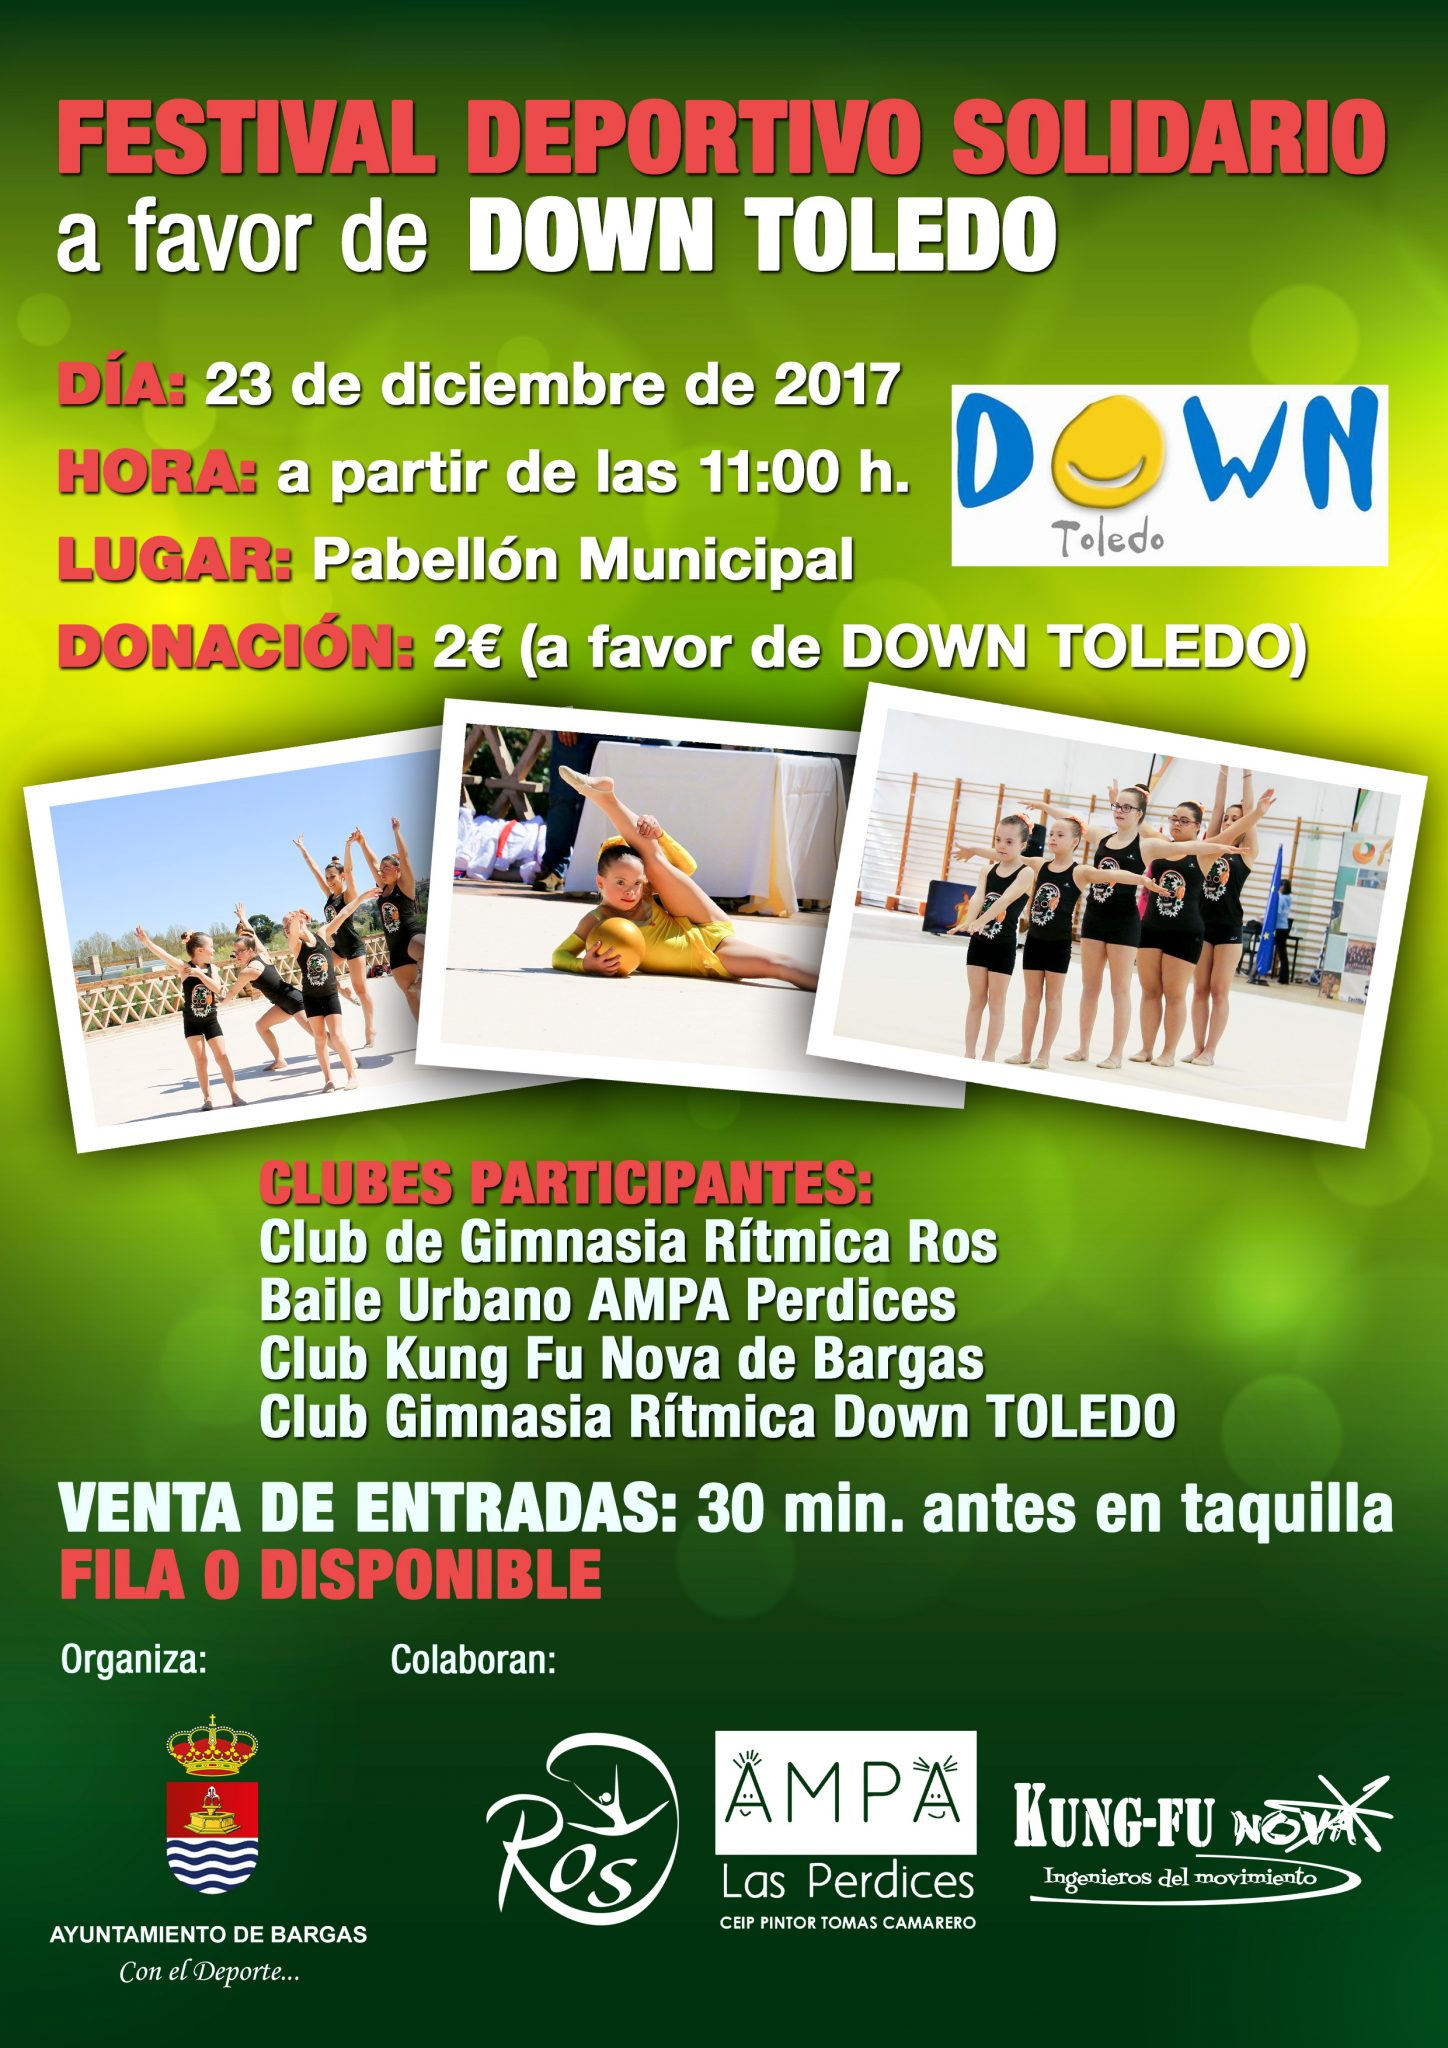 Festival Deportivo Solidario a favor de Down Toledo